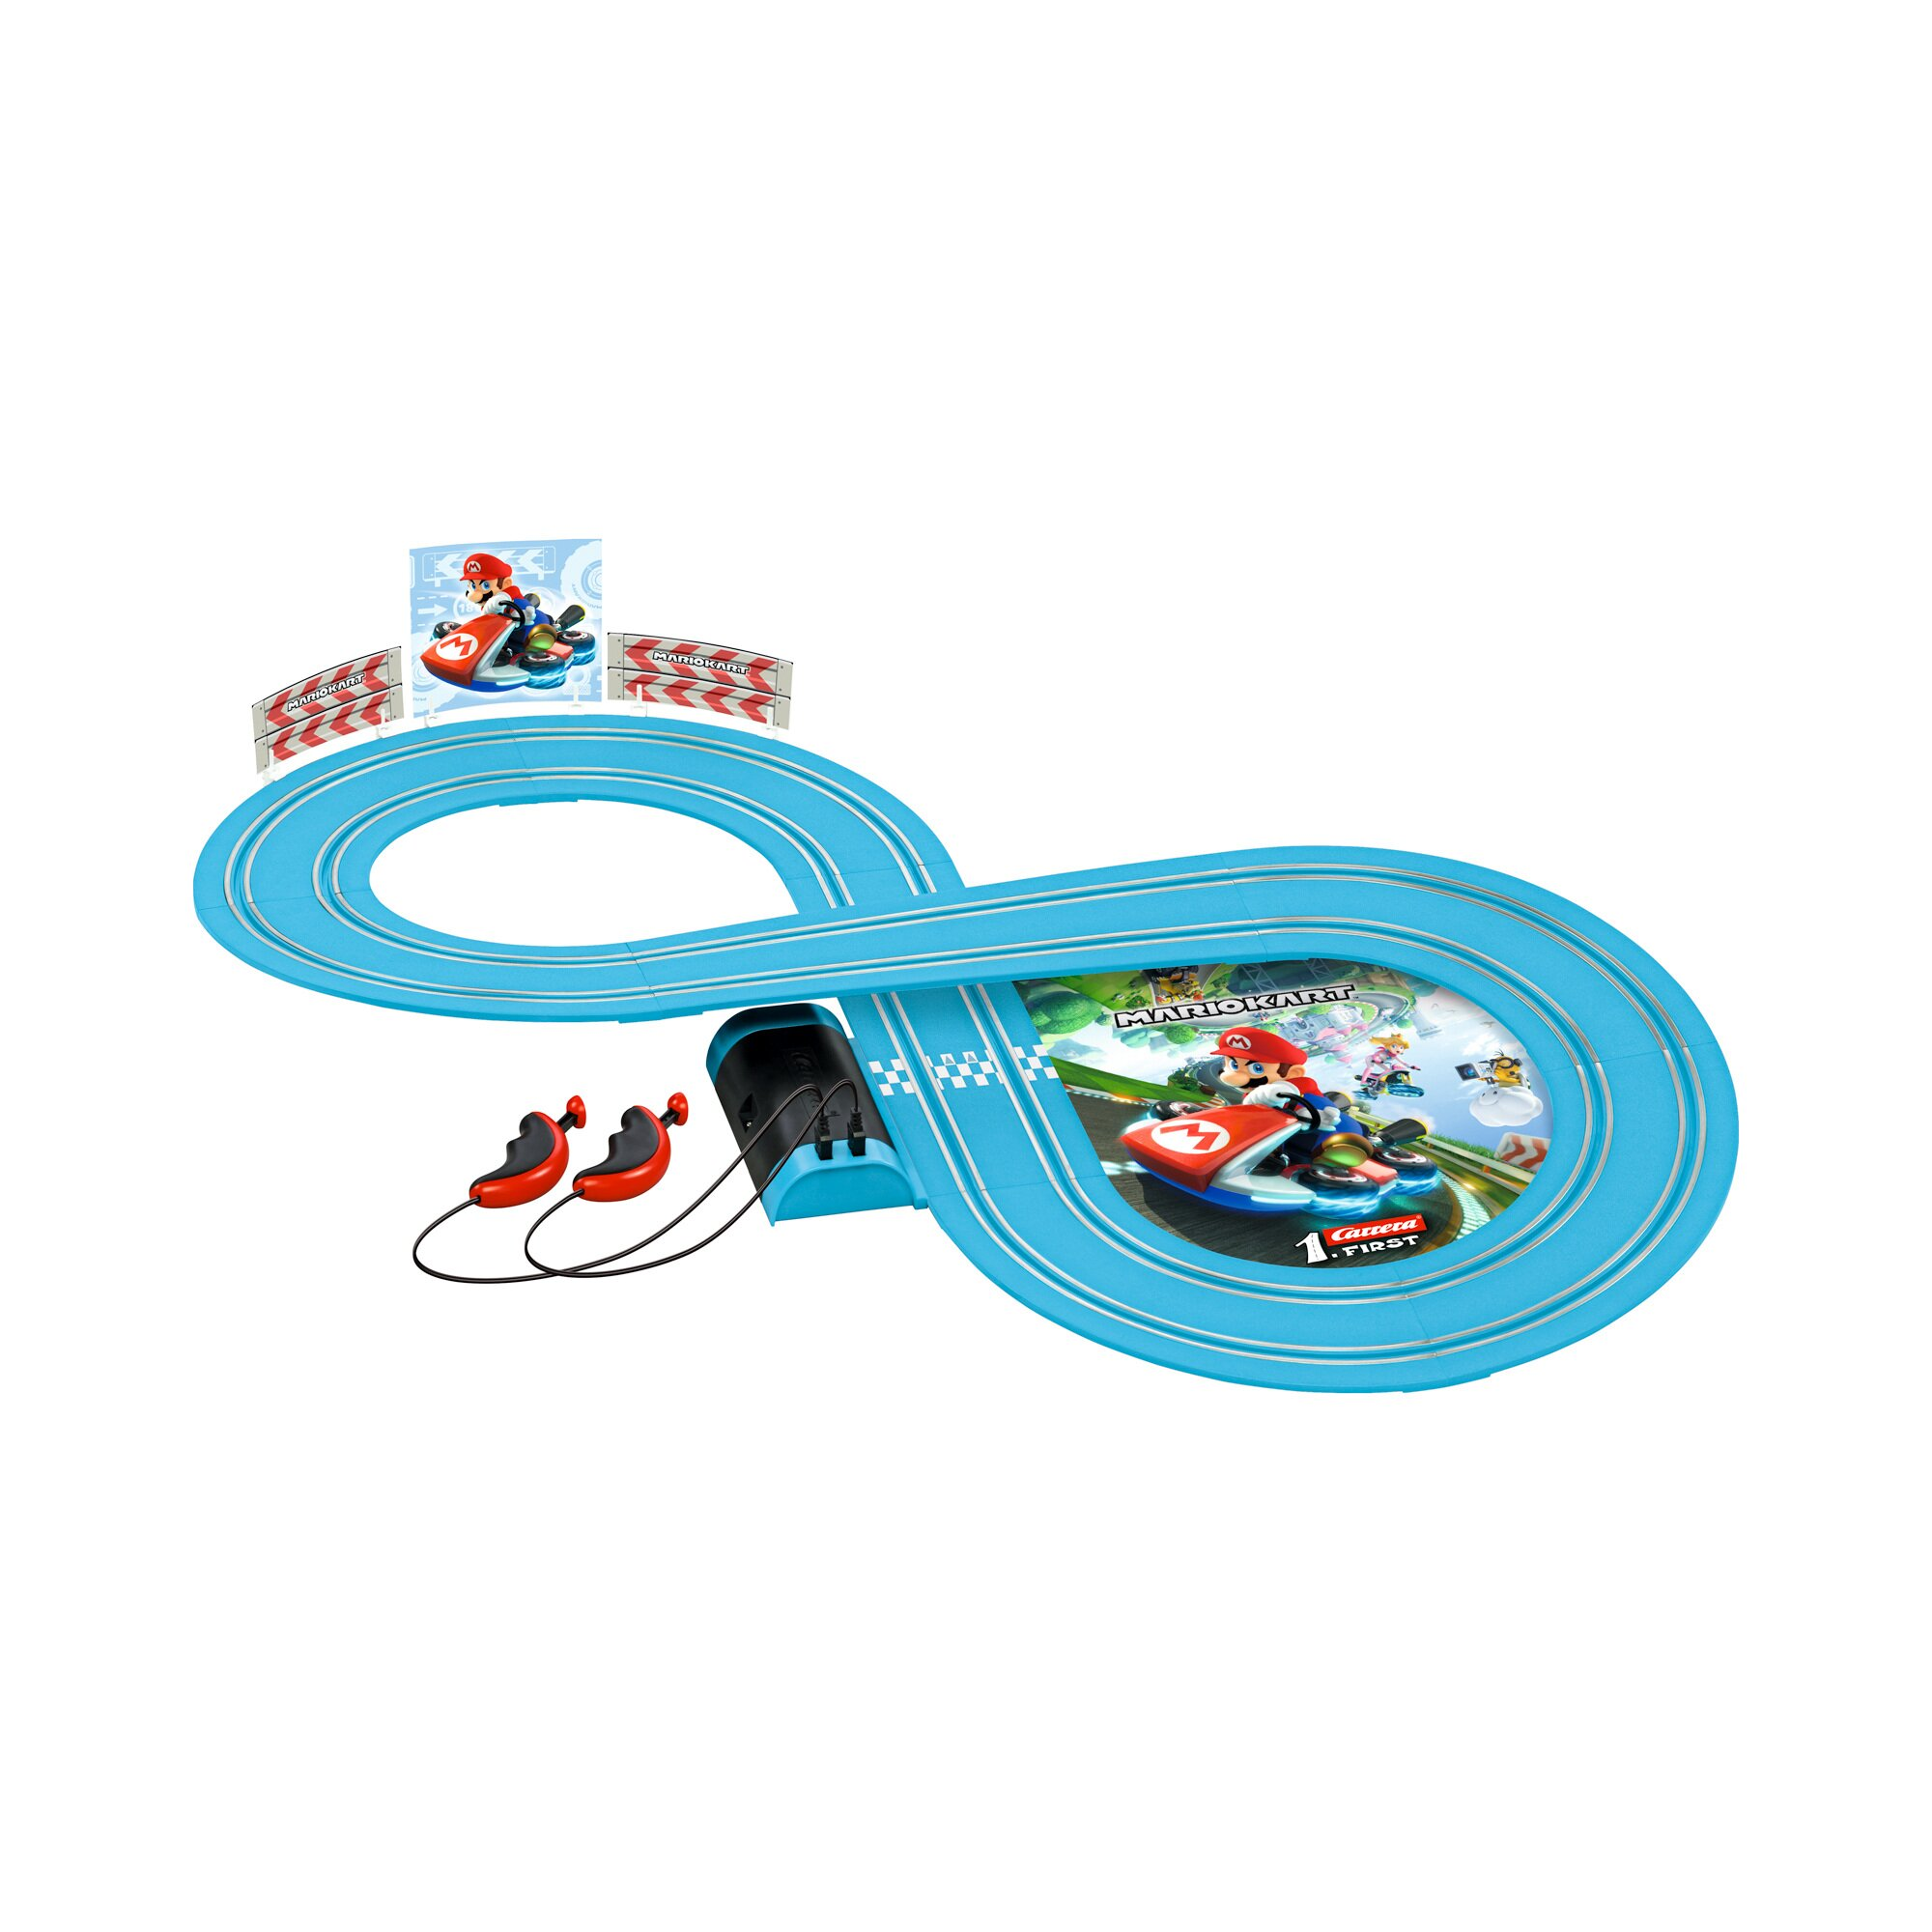 Mario Kart Auto-Rennbahn Carrera First Nintendo Mario Kart™